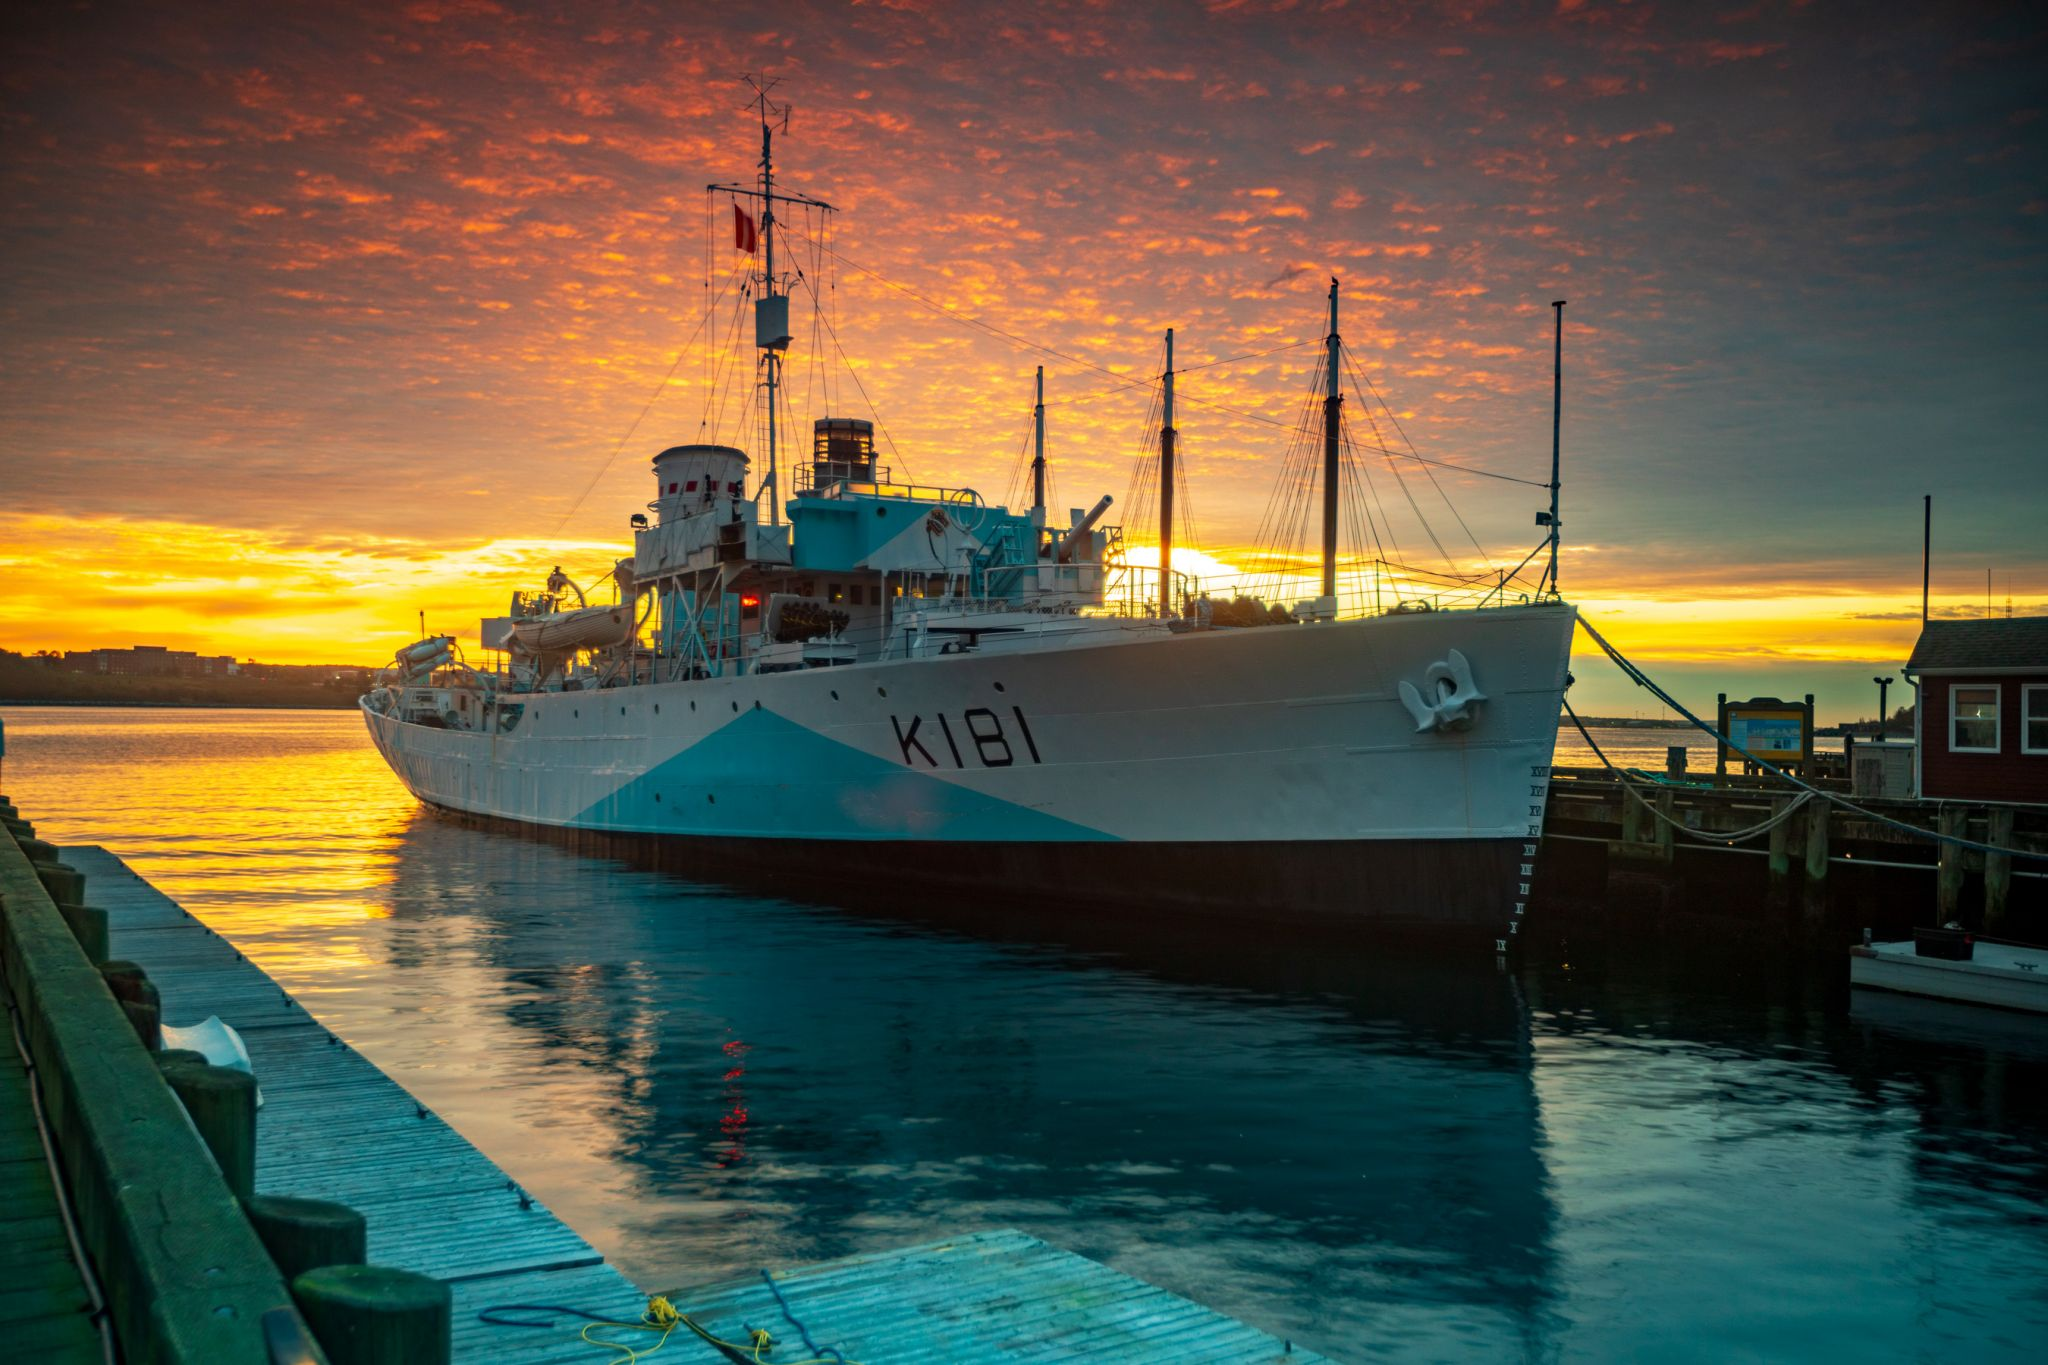 HMCS Sackville sunrise wharf Halifax, Nova Scotia, Canada